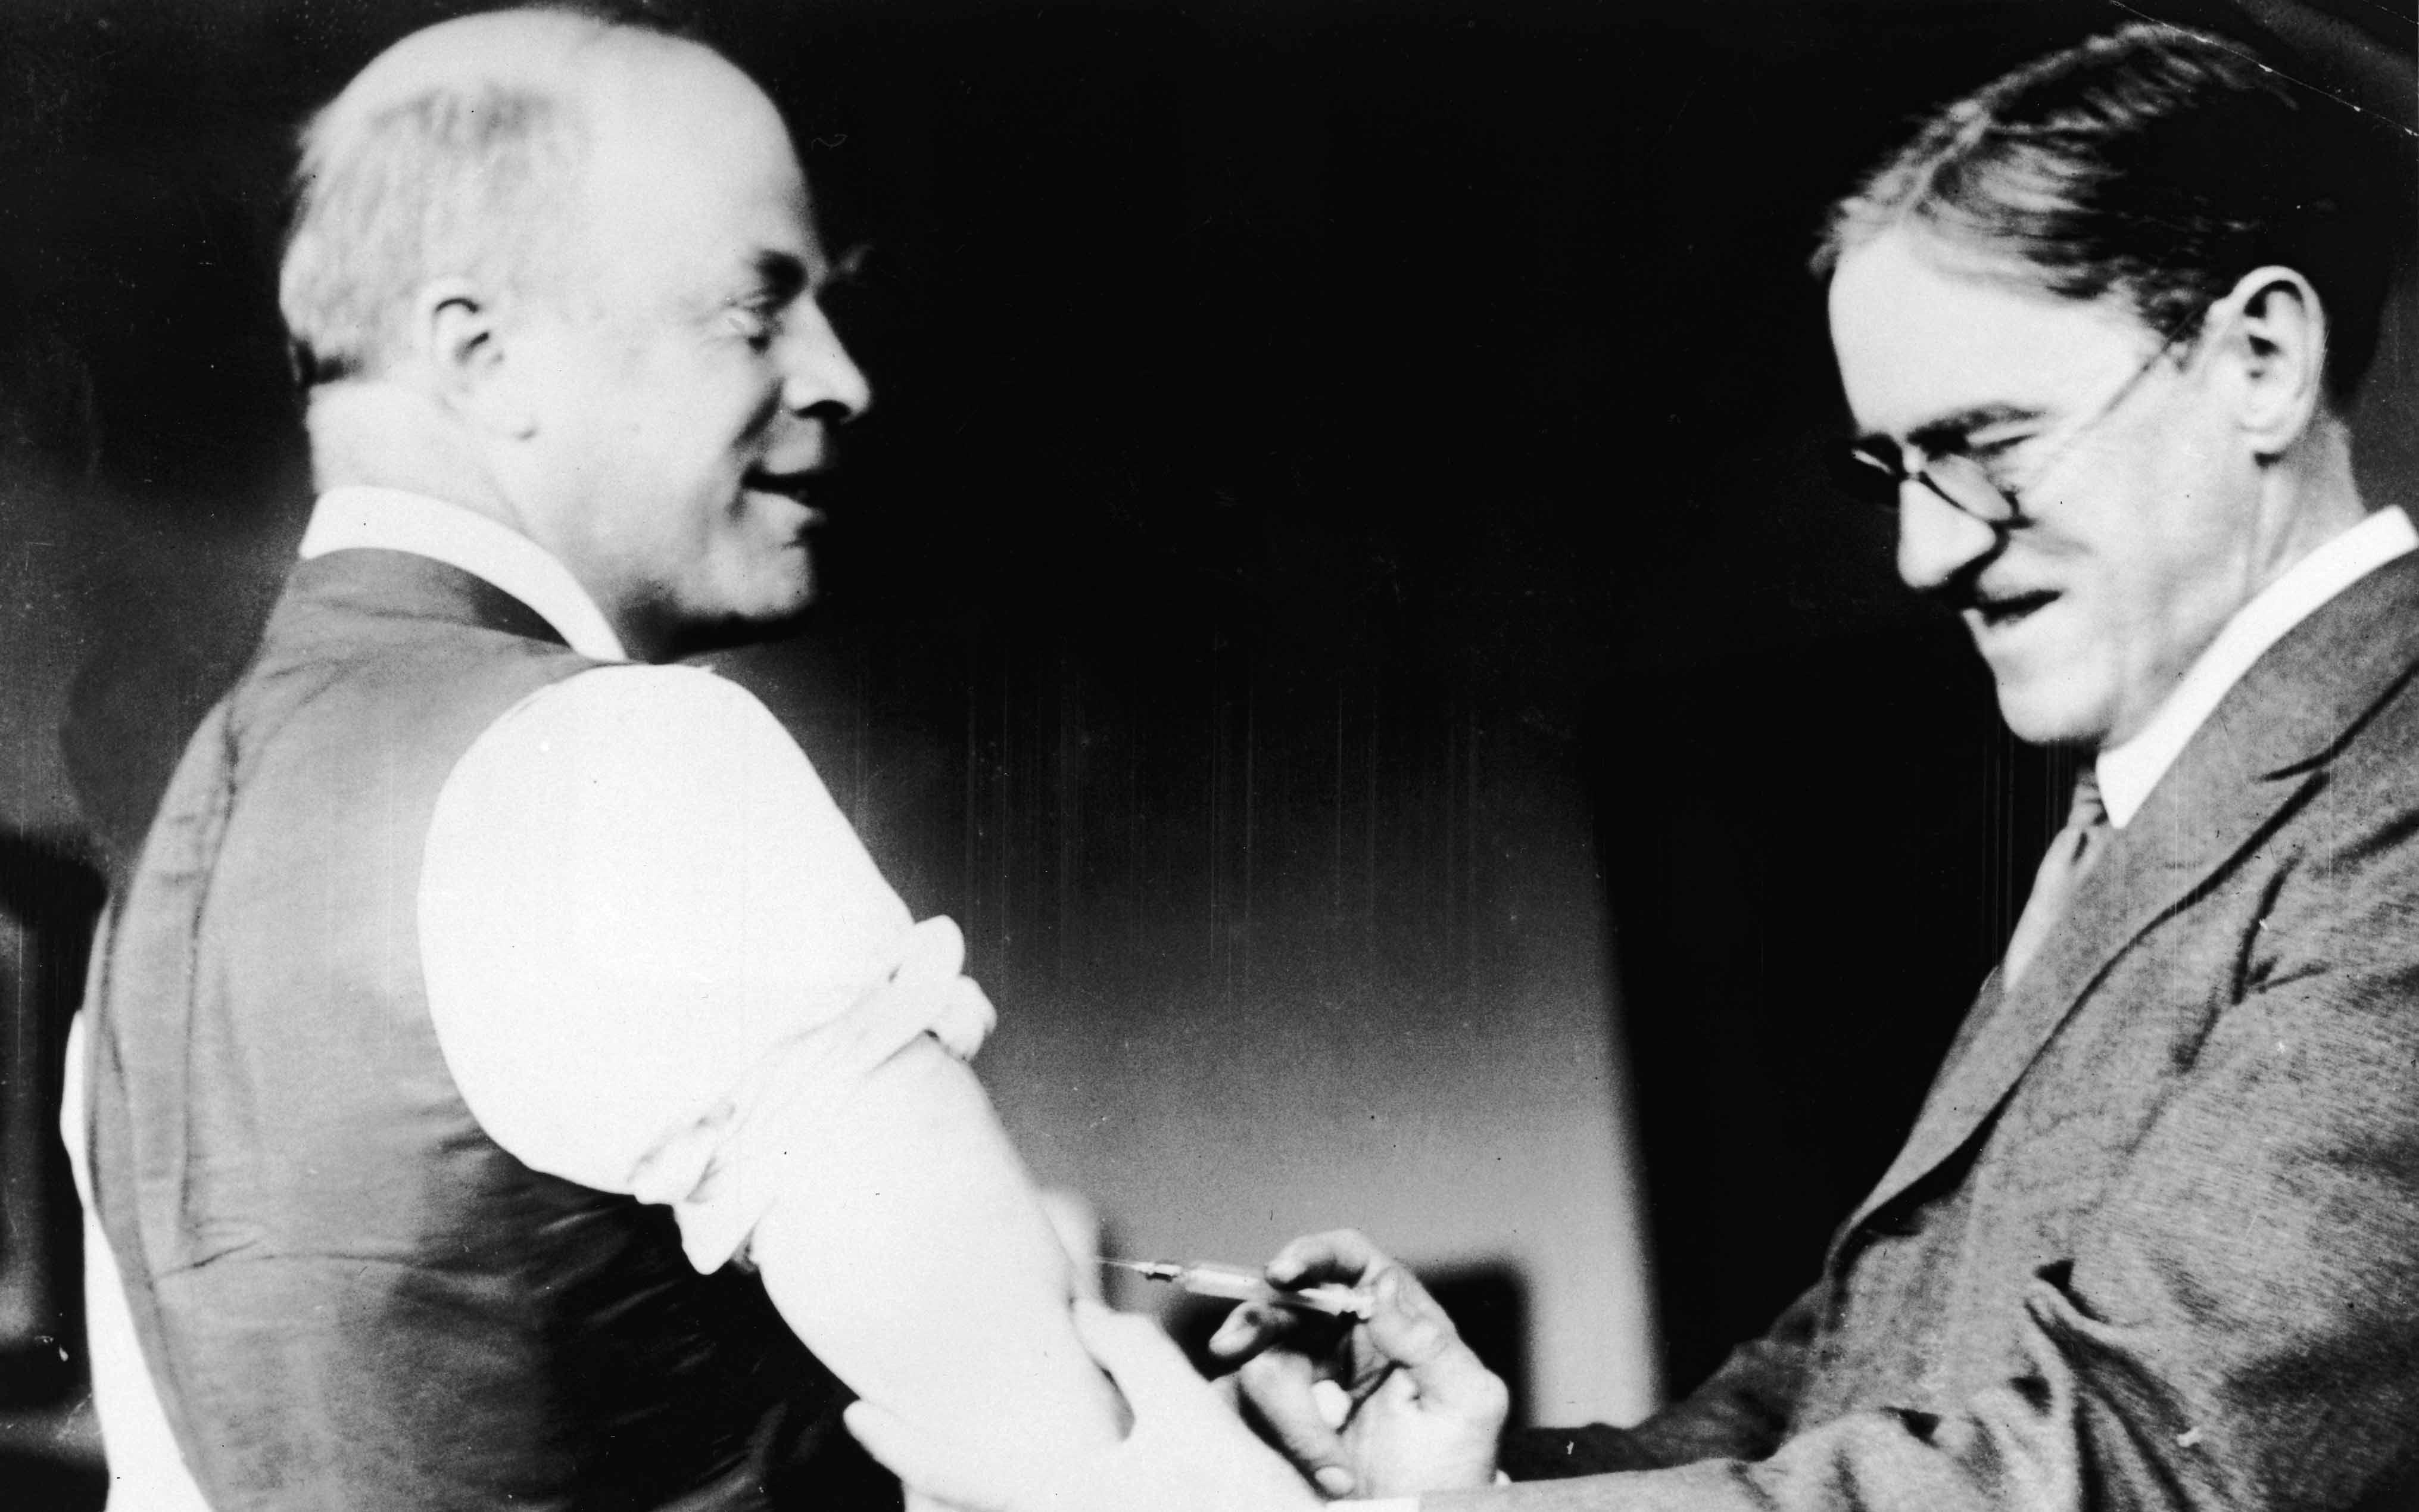 The 100th anniversary of the Spanish flu | IrishCentral com